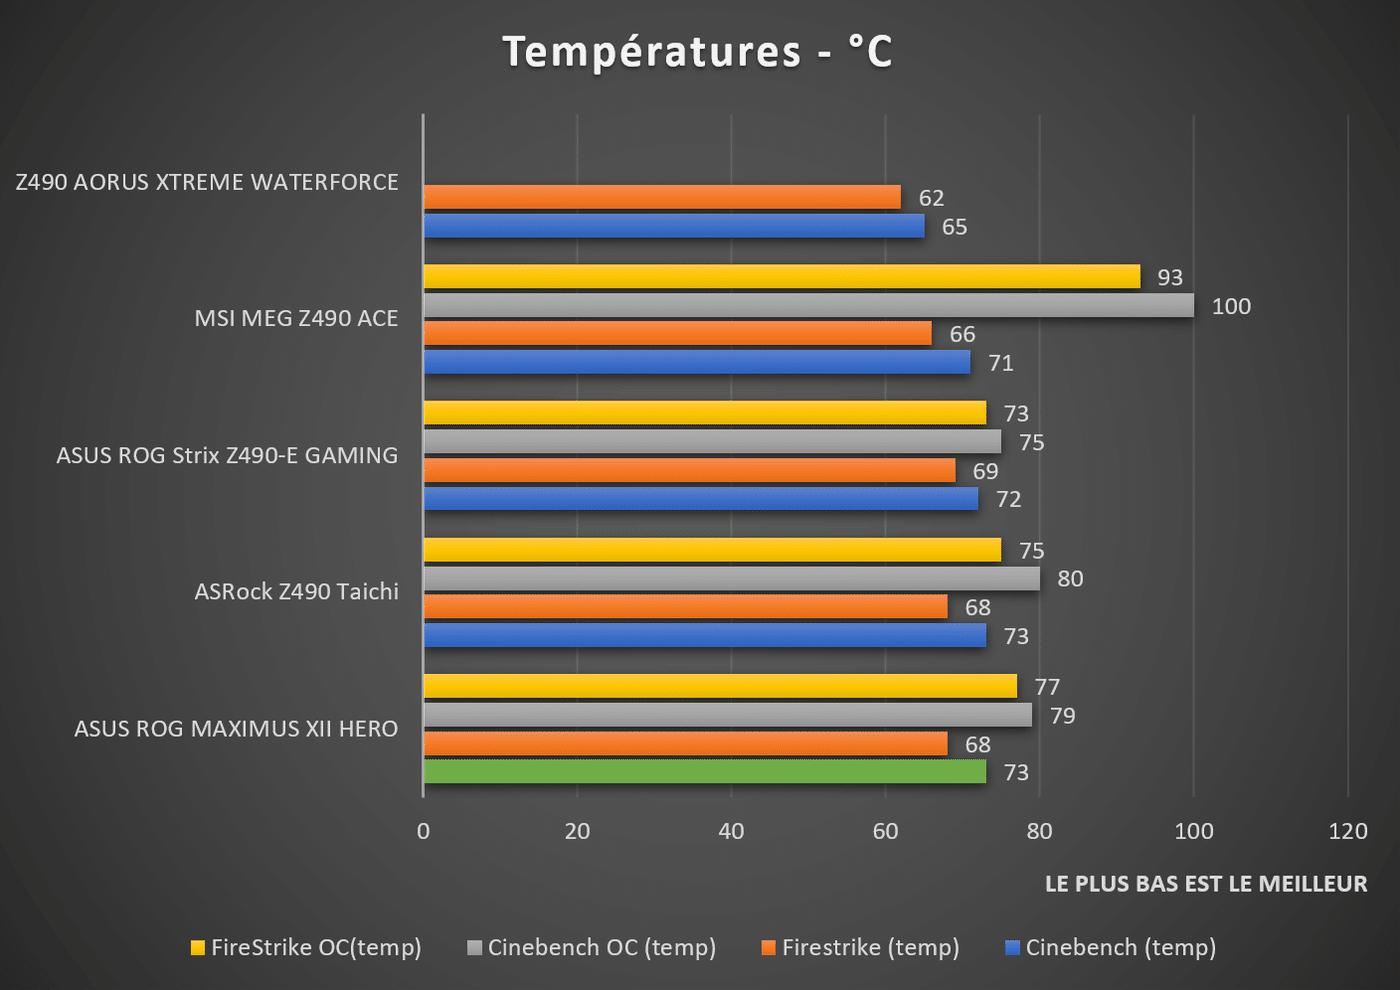 Test températures ASUS ROG MAXIMUS XII HERO